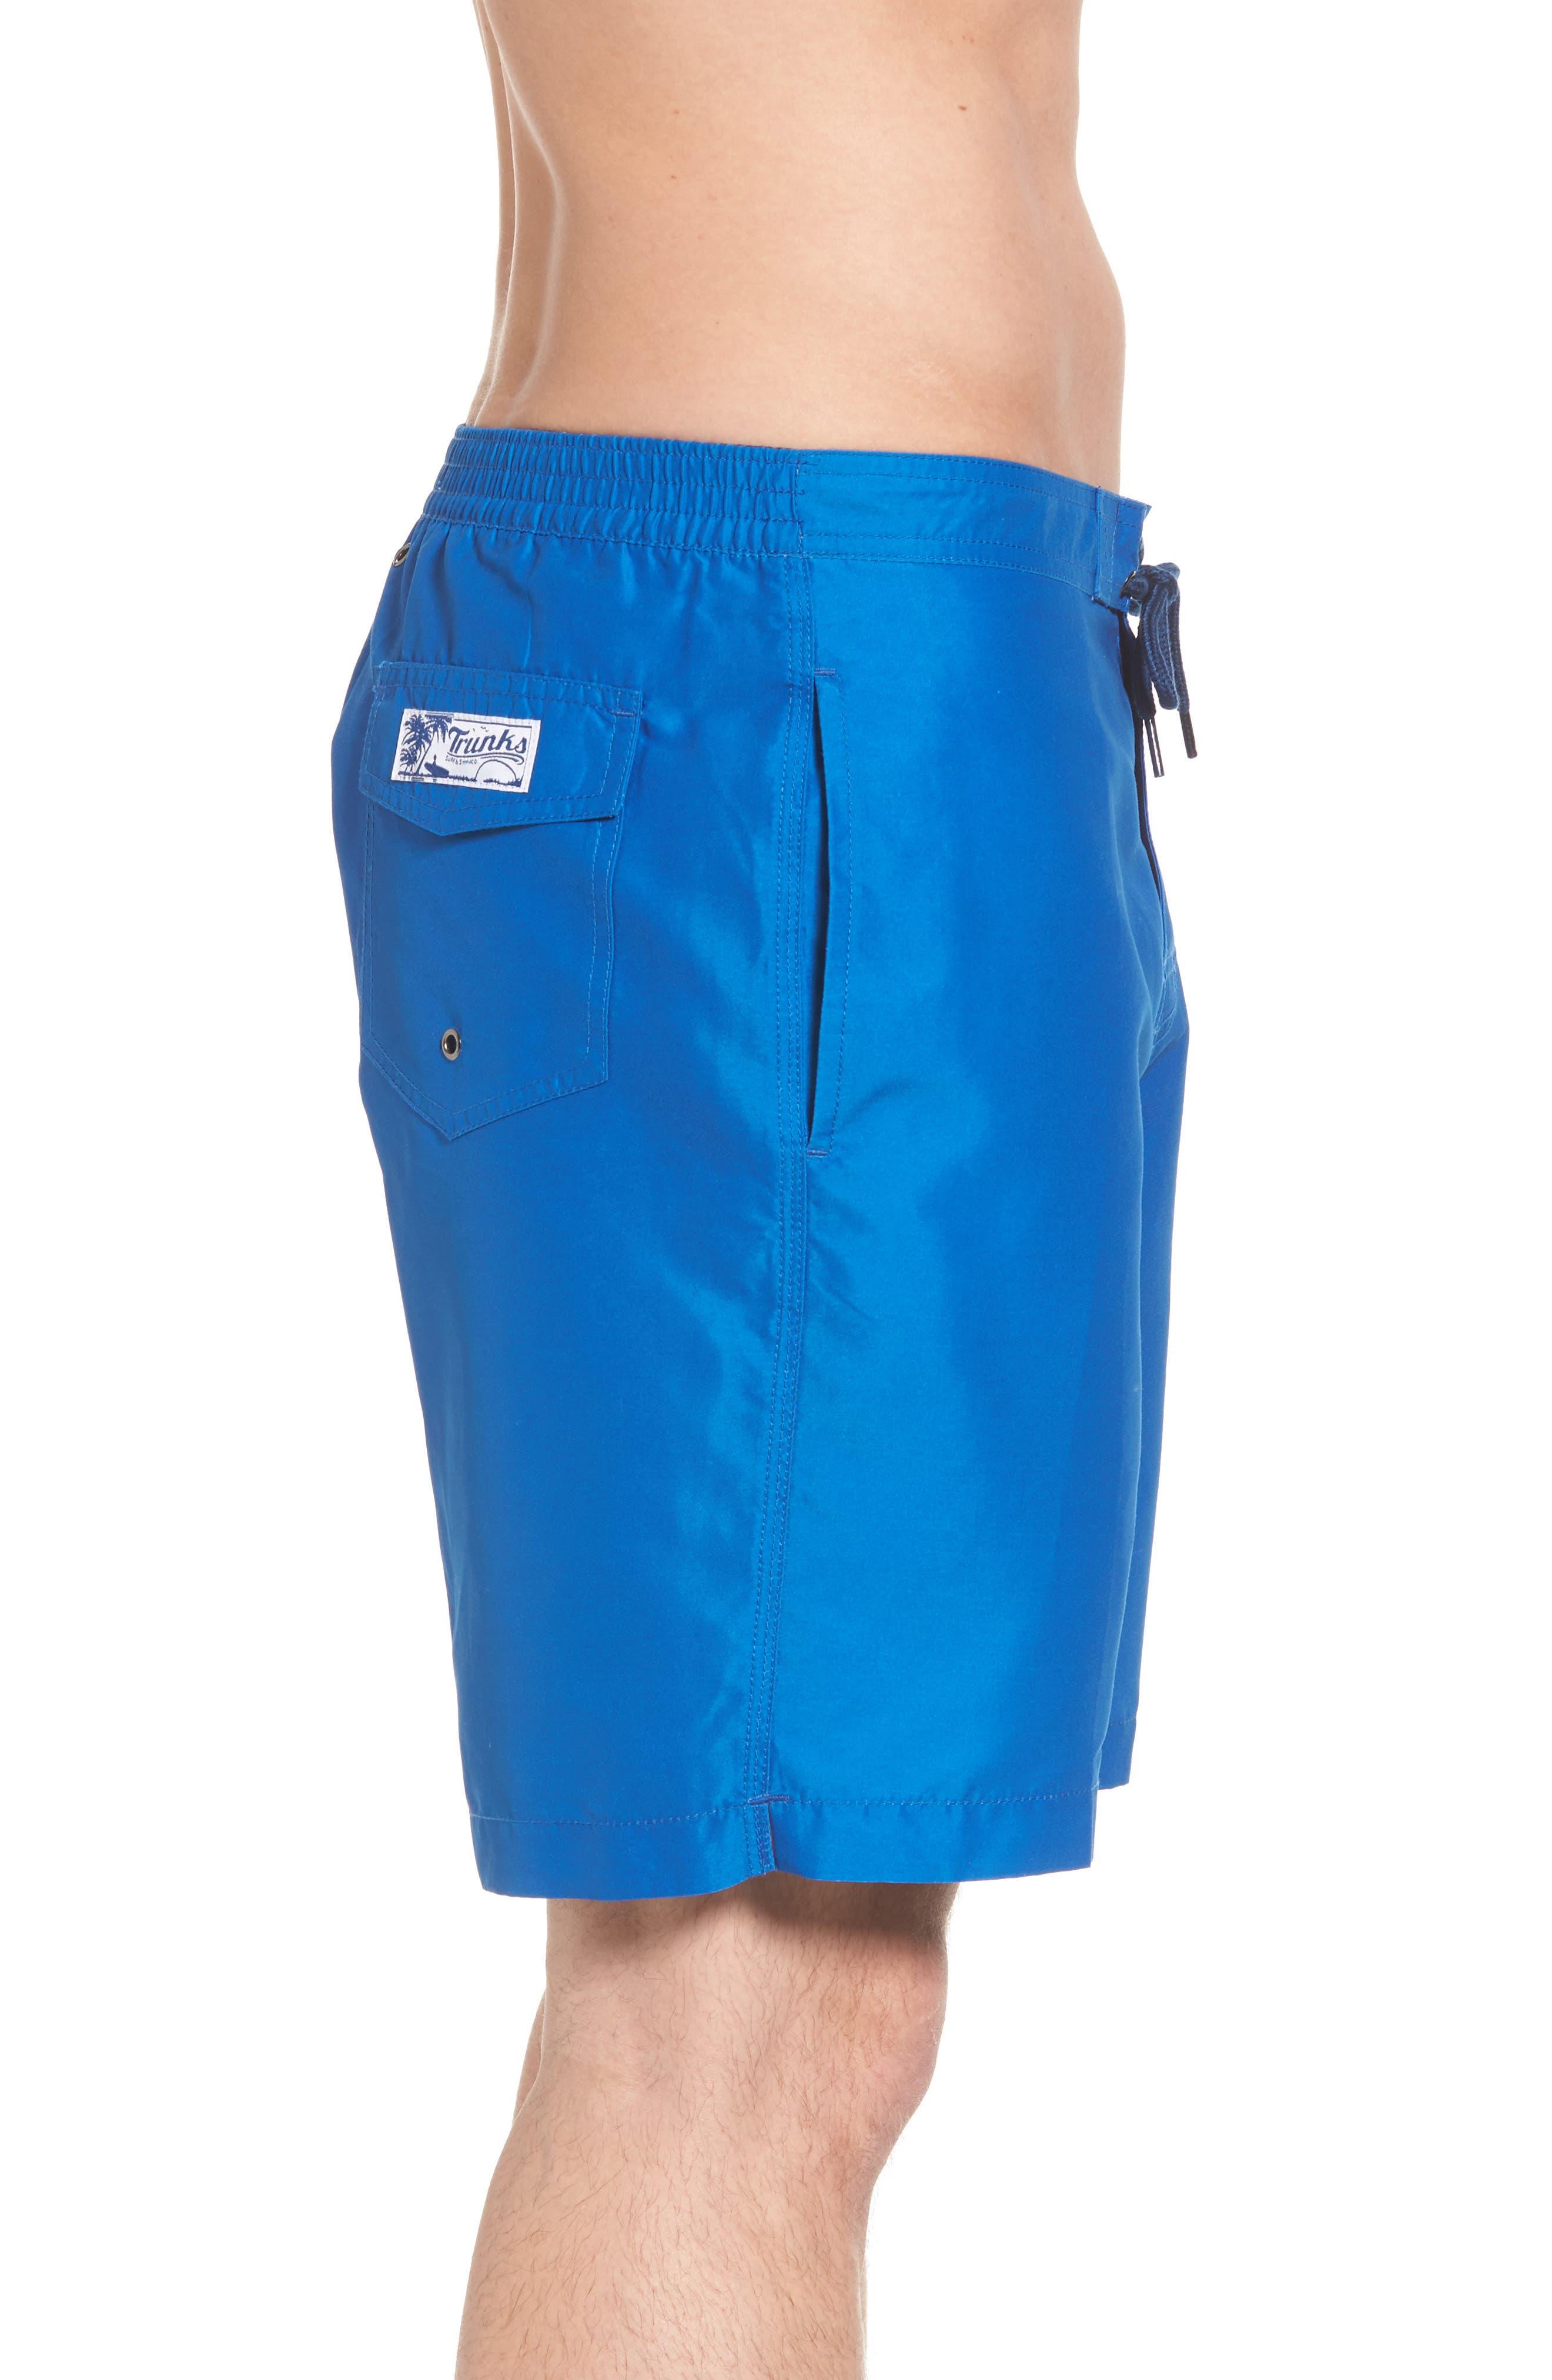 Swami Solid Board Shorts,                             Alternate thumbnail 3, color,                             Nautical Blue/ Marine